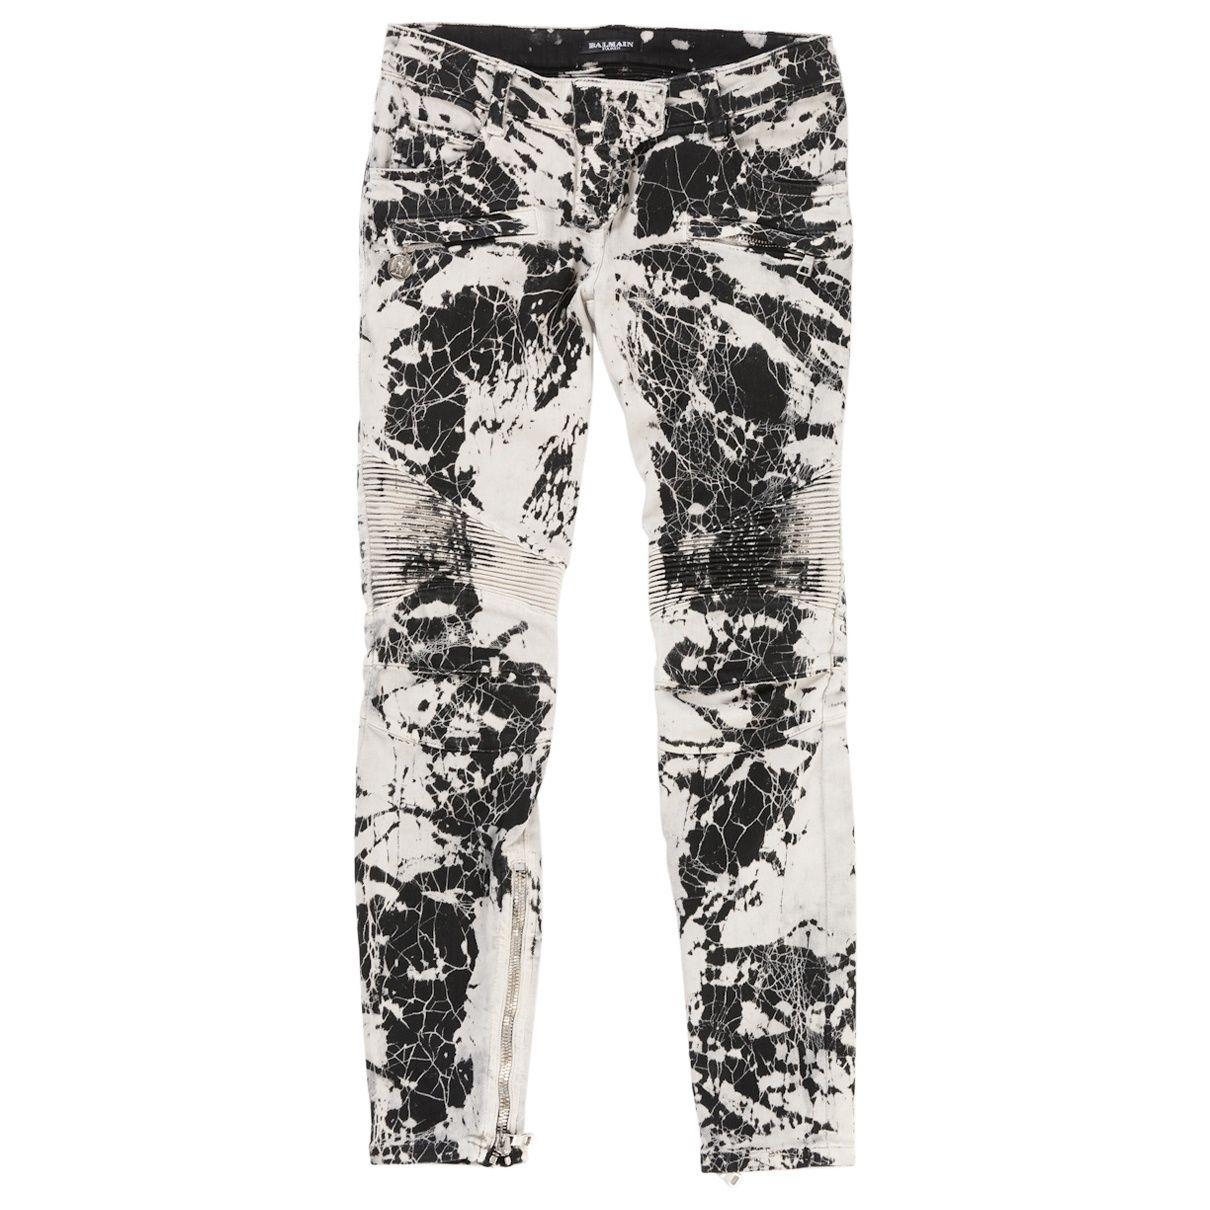 4a377b3c9e4fb Cotton Jeans | Dress up! | Jeans, Balmain, Pants